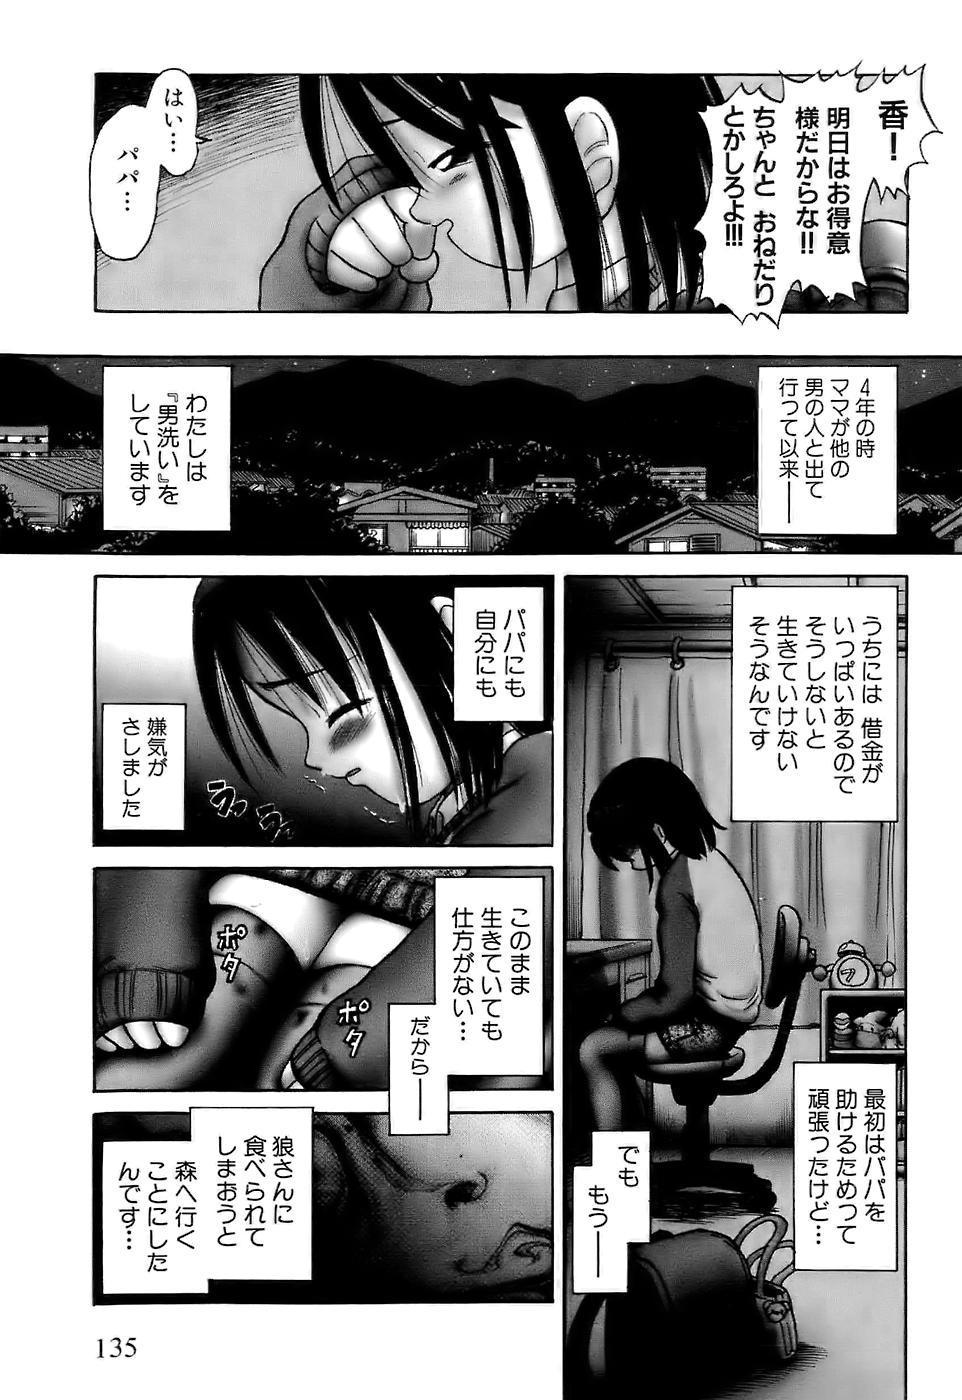 [Bow Rei] Osanai Kajitsu -Inkou Shougakusei no Houkago- Jou 136